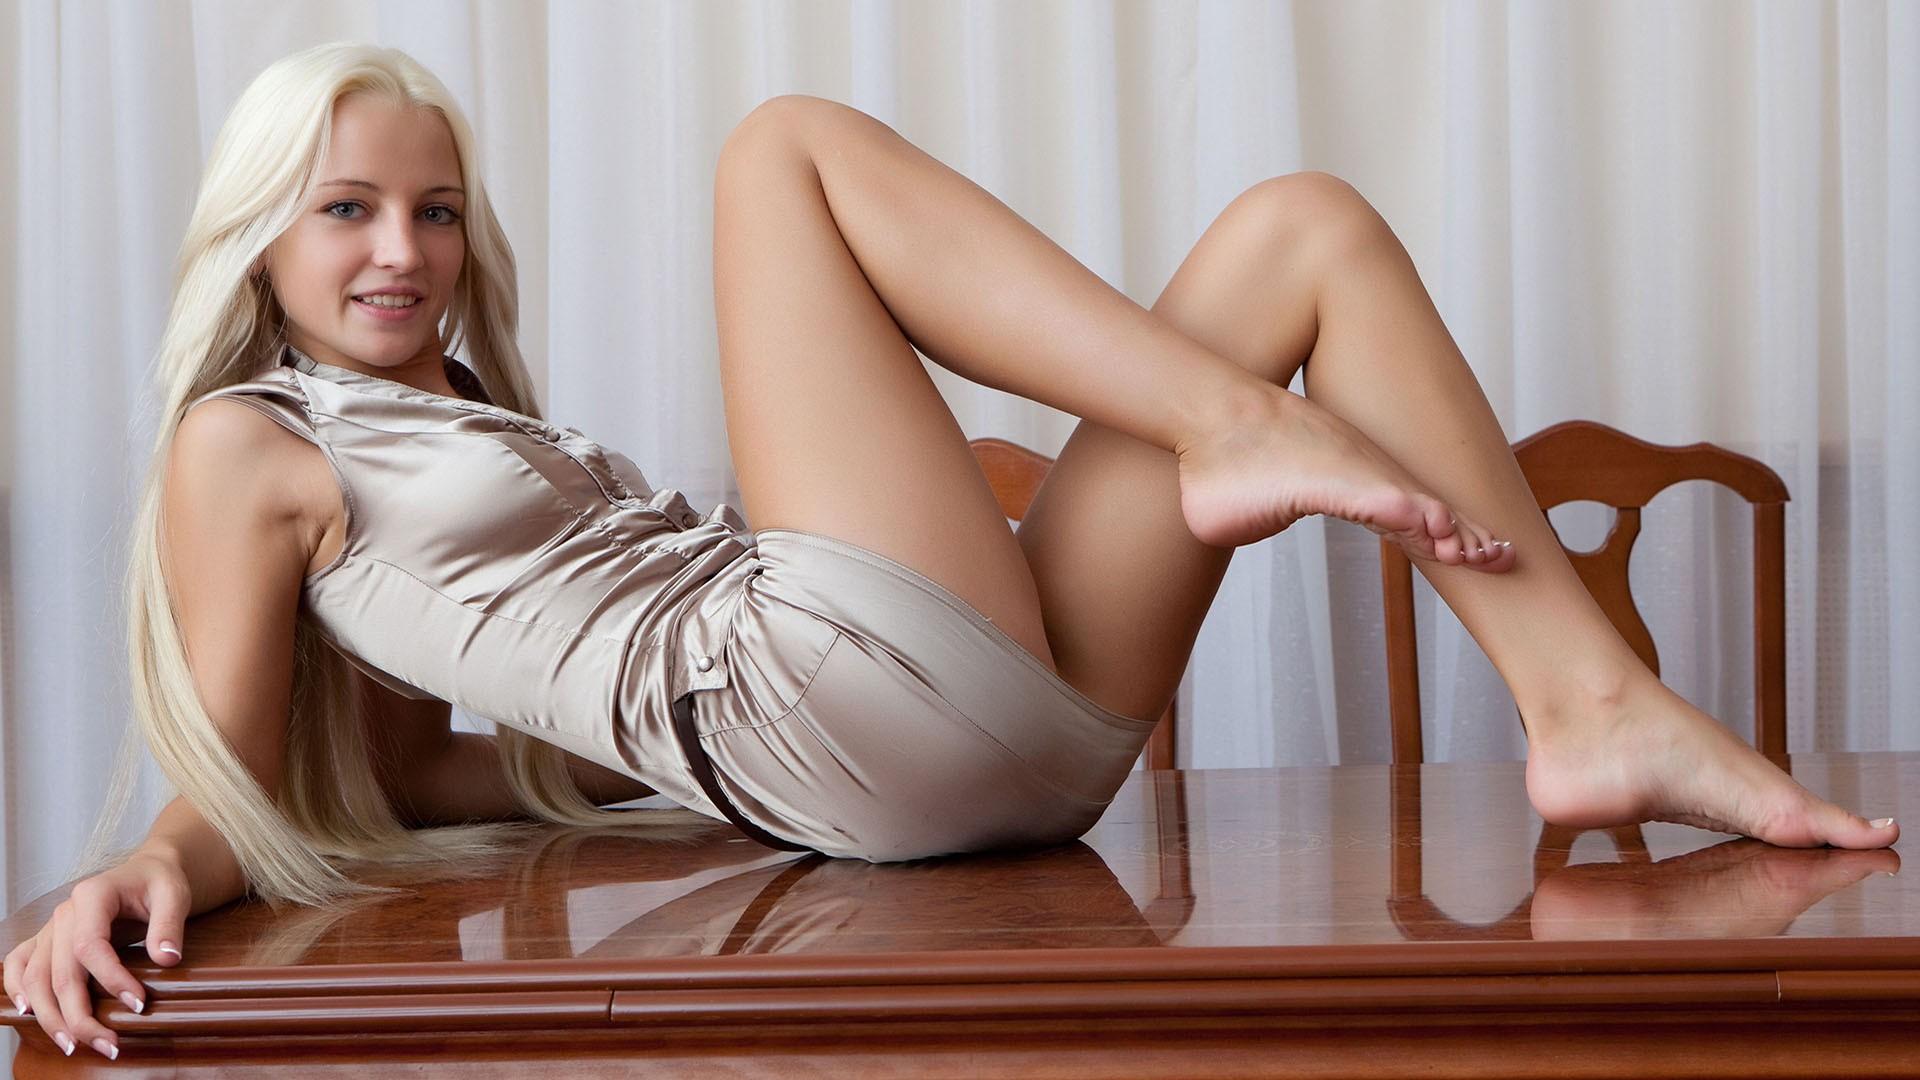 People 1920x1080 feet Alysha A blonde toes legs women model satin barefoot